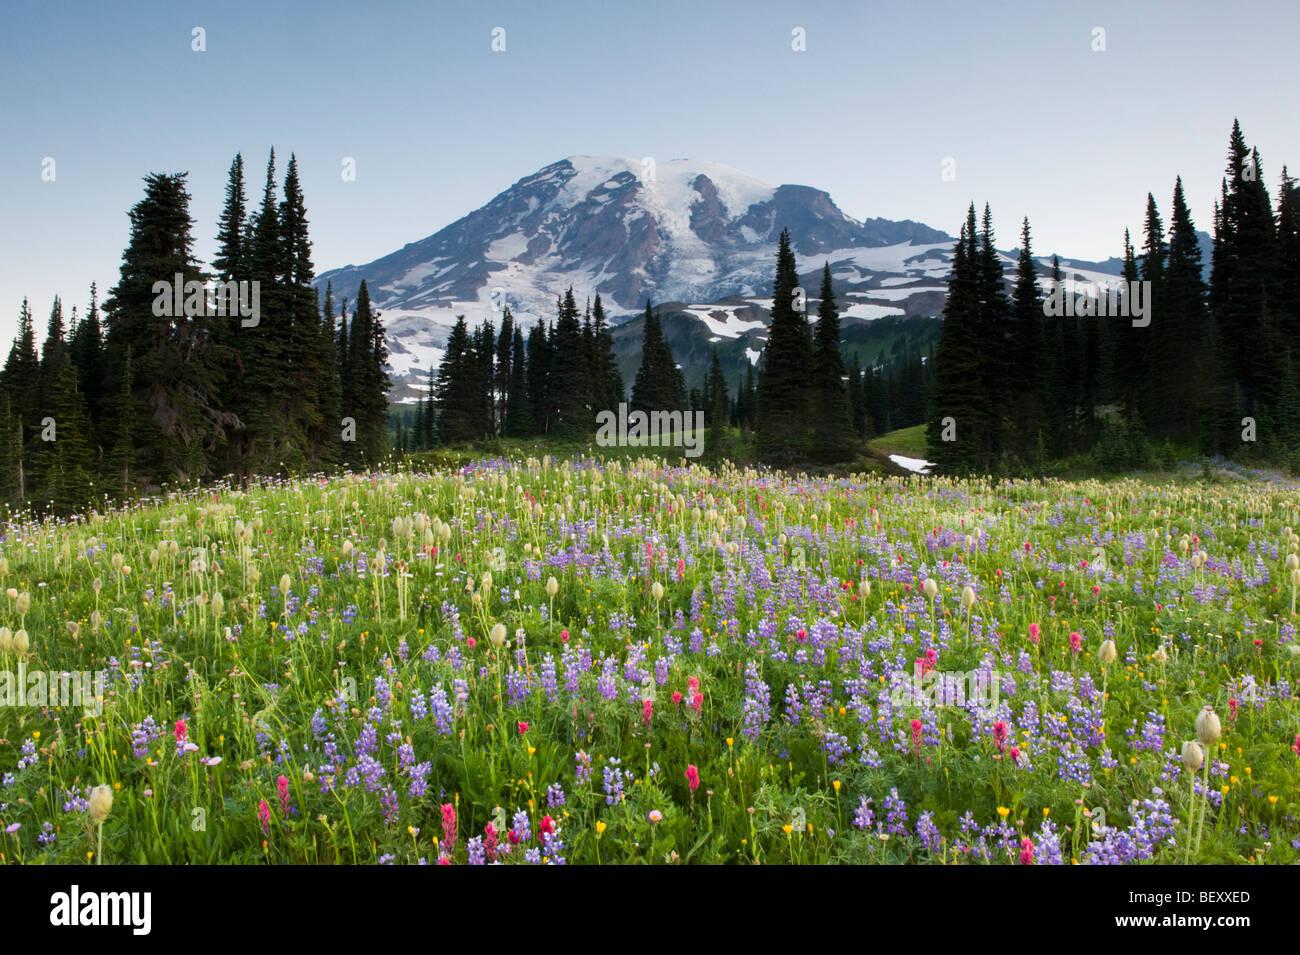 Summer Wildflowers, Paradise Area, Mount Rainier National Park, Washington JULY - Stock Image